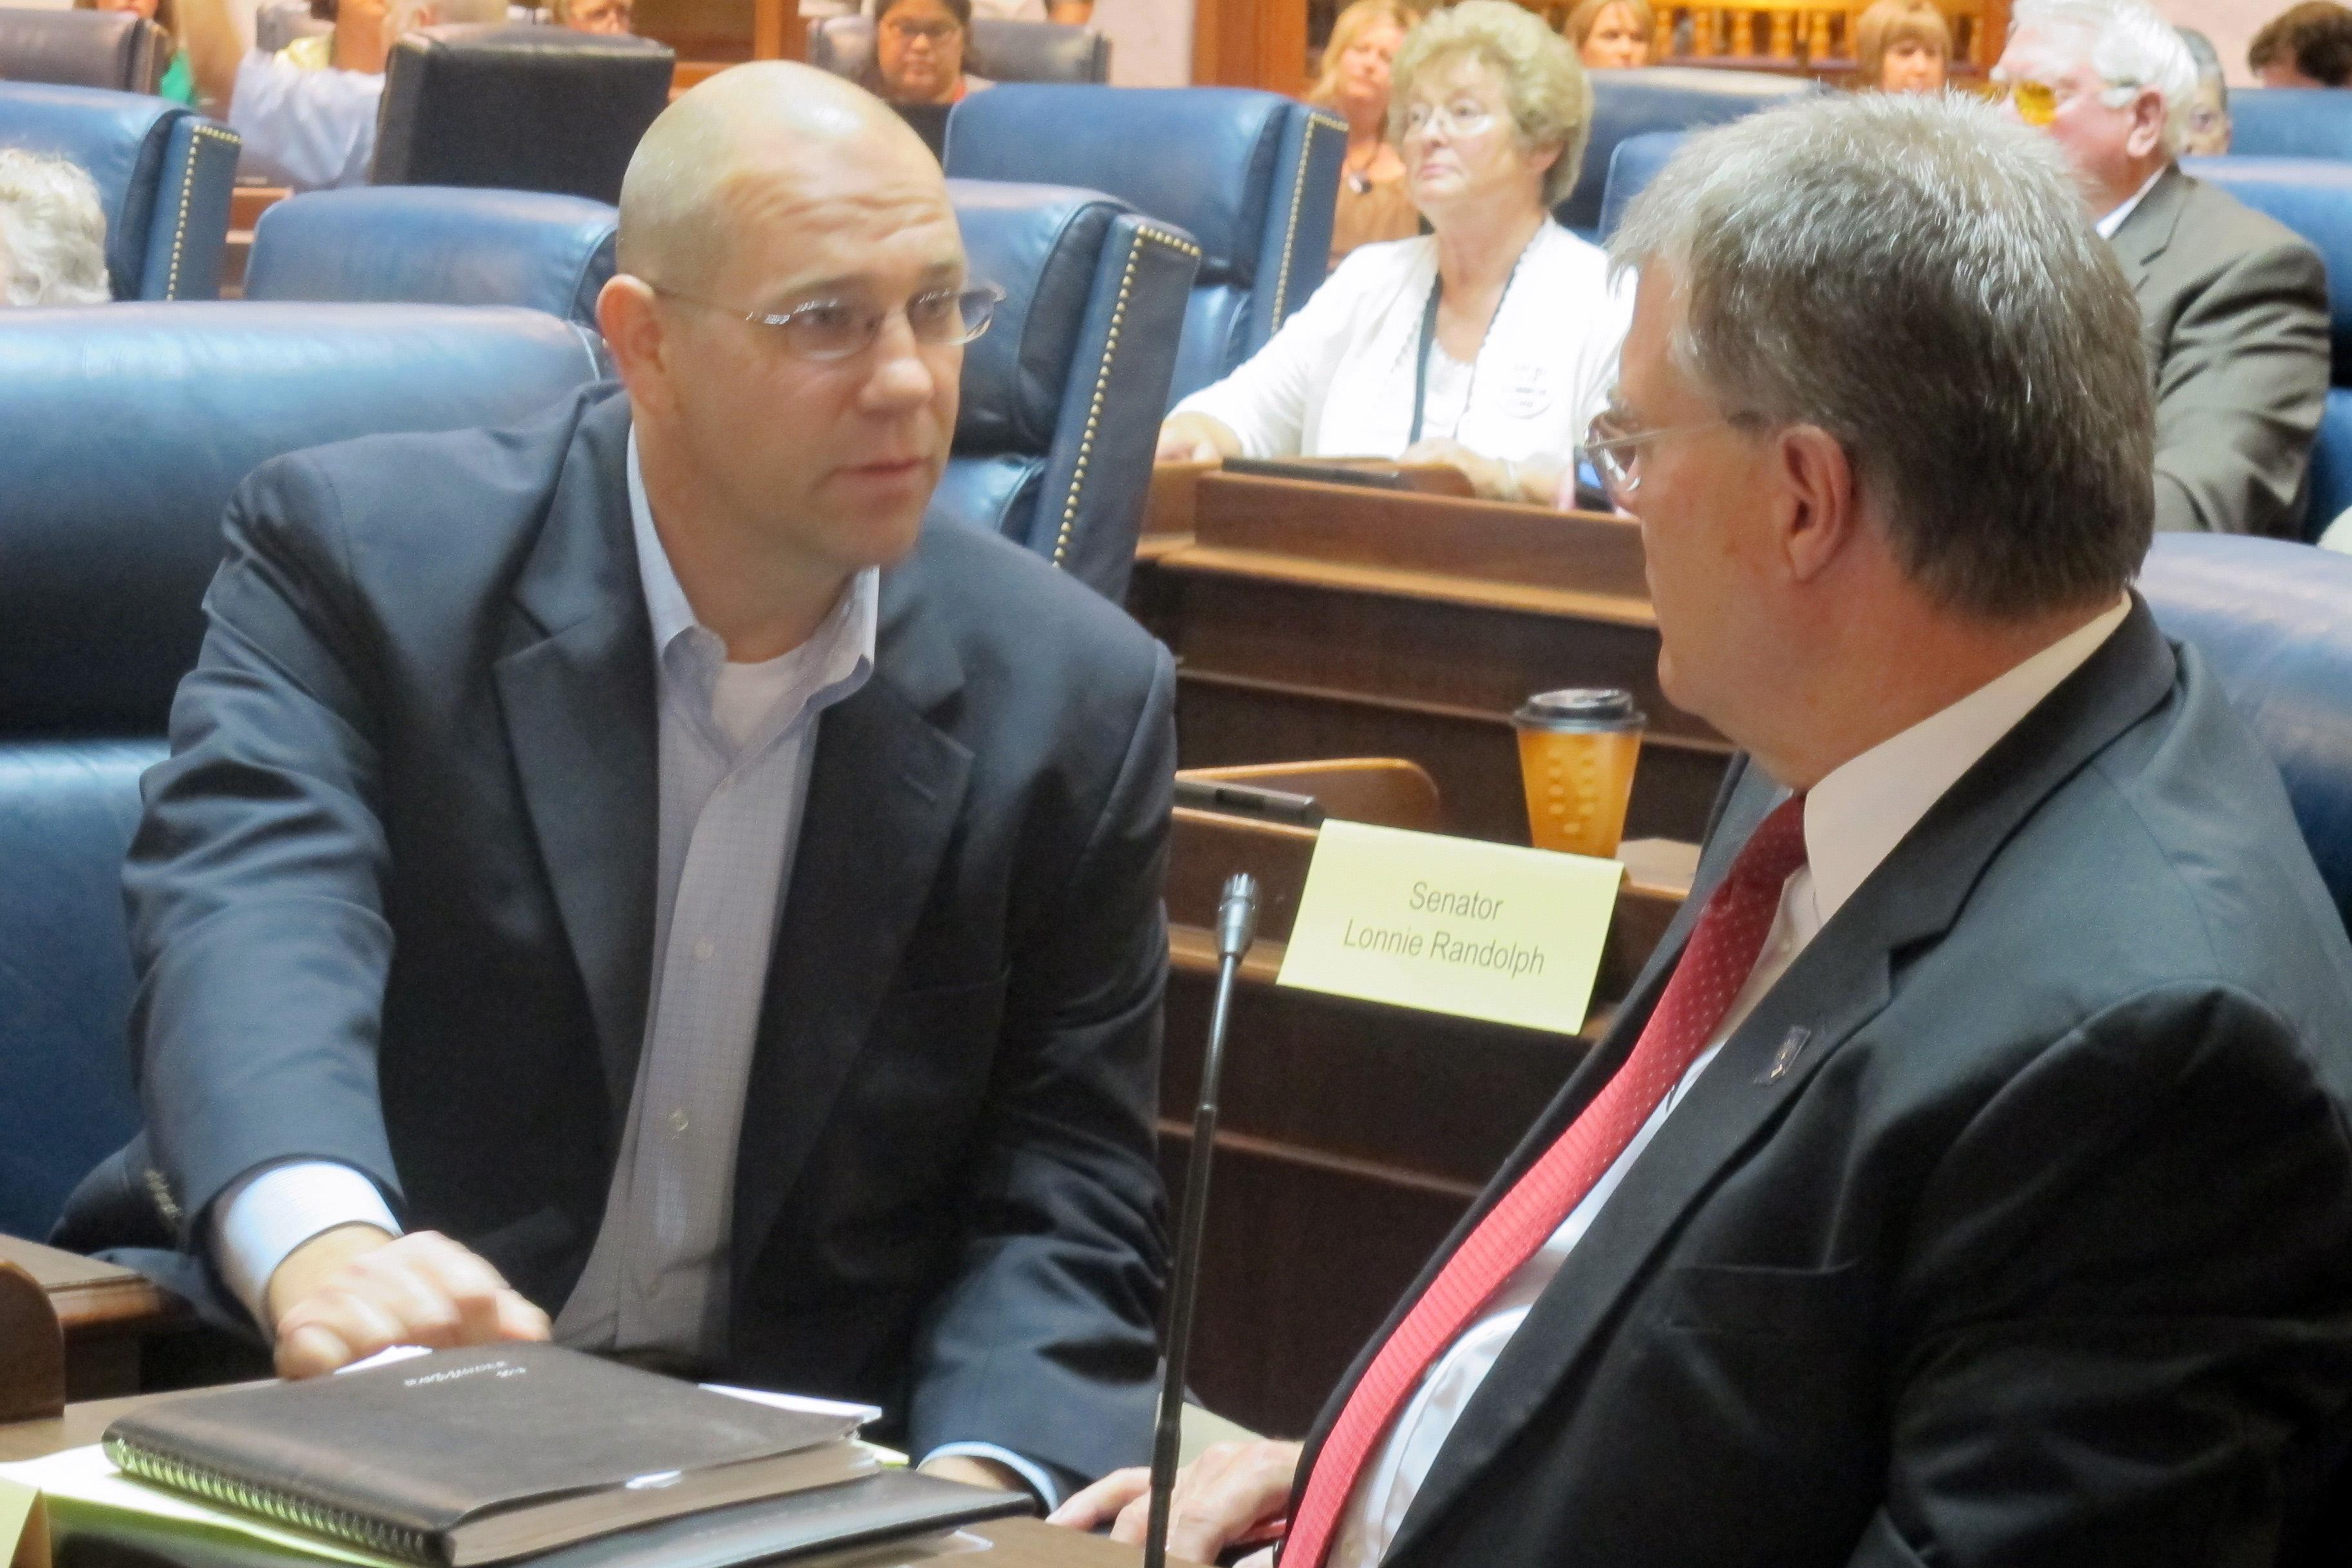 Sen. Scott Schneider, R-Indianapolis, talks with Sen. Tim Skinner, D-Terre Haute, during a summer legislative hearing on the Common Core academic standards.